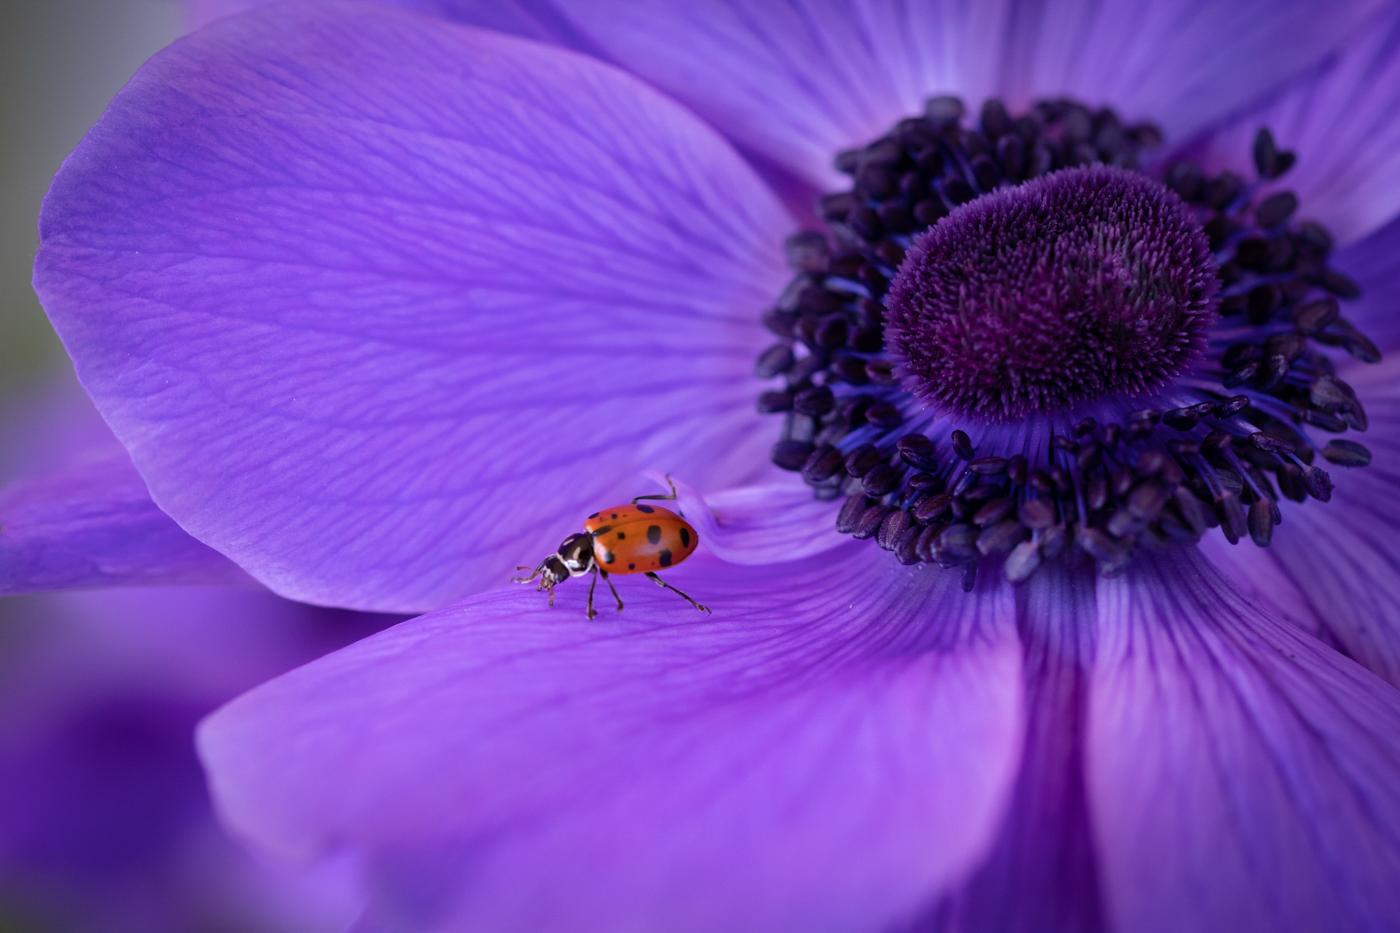 15Assigned_Terry_Miranda_1_Ladybug_loves_purple